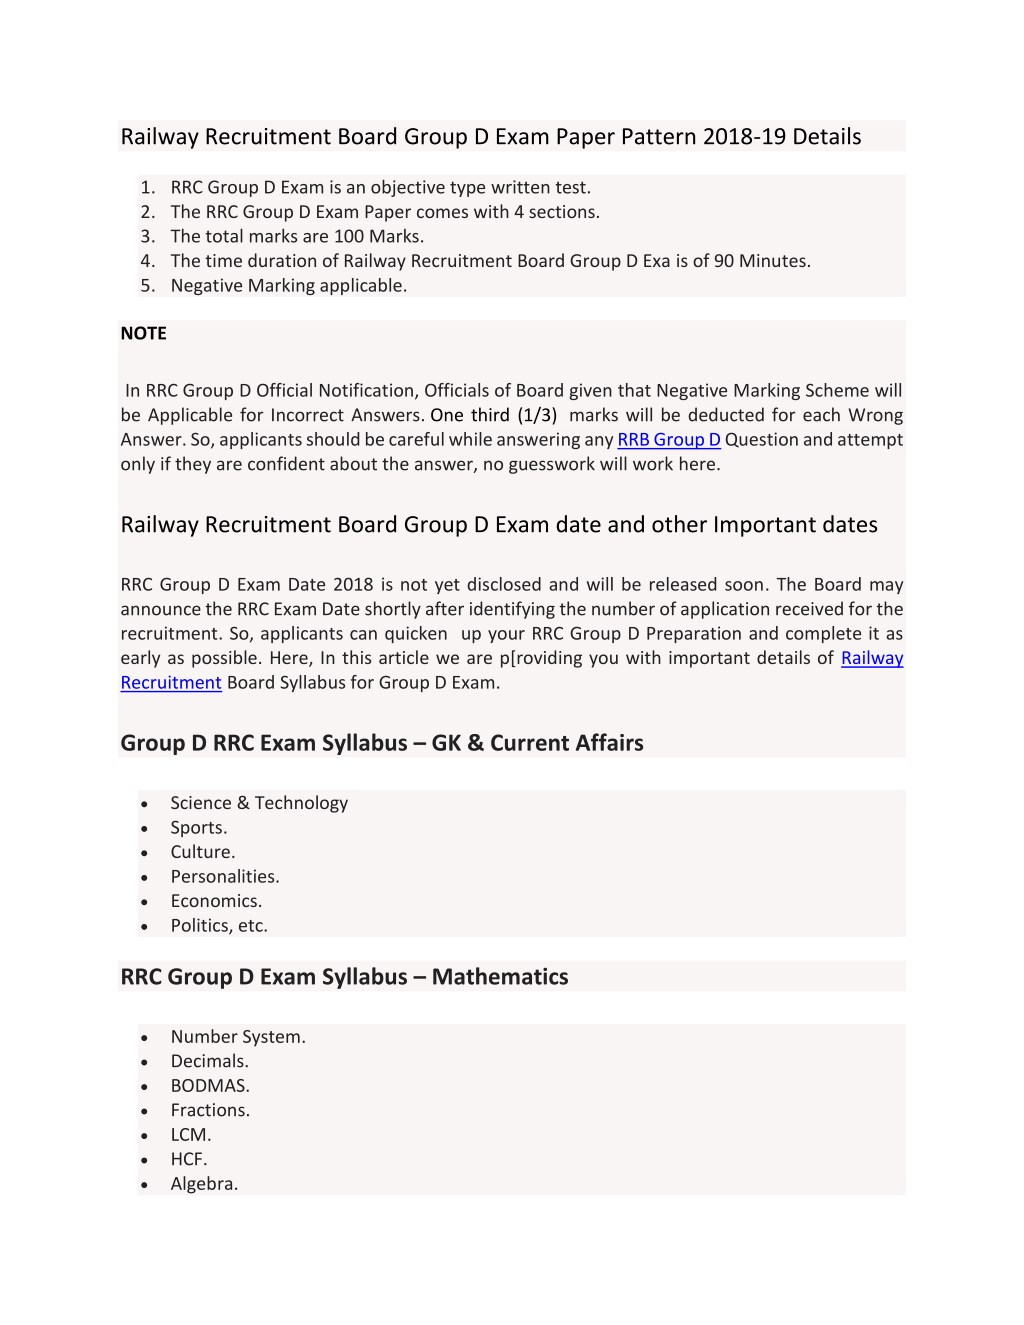 PPT - Railway Recruitment Board Group D Exam Paper Pattern